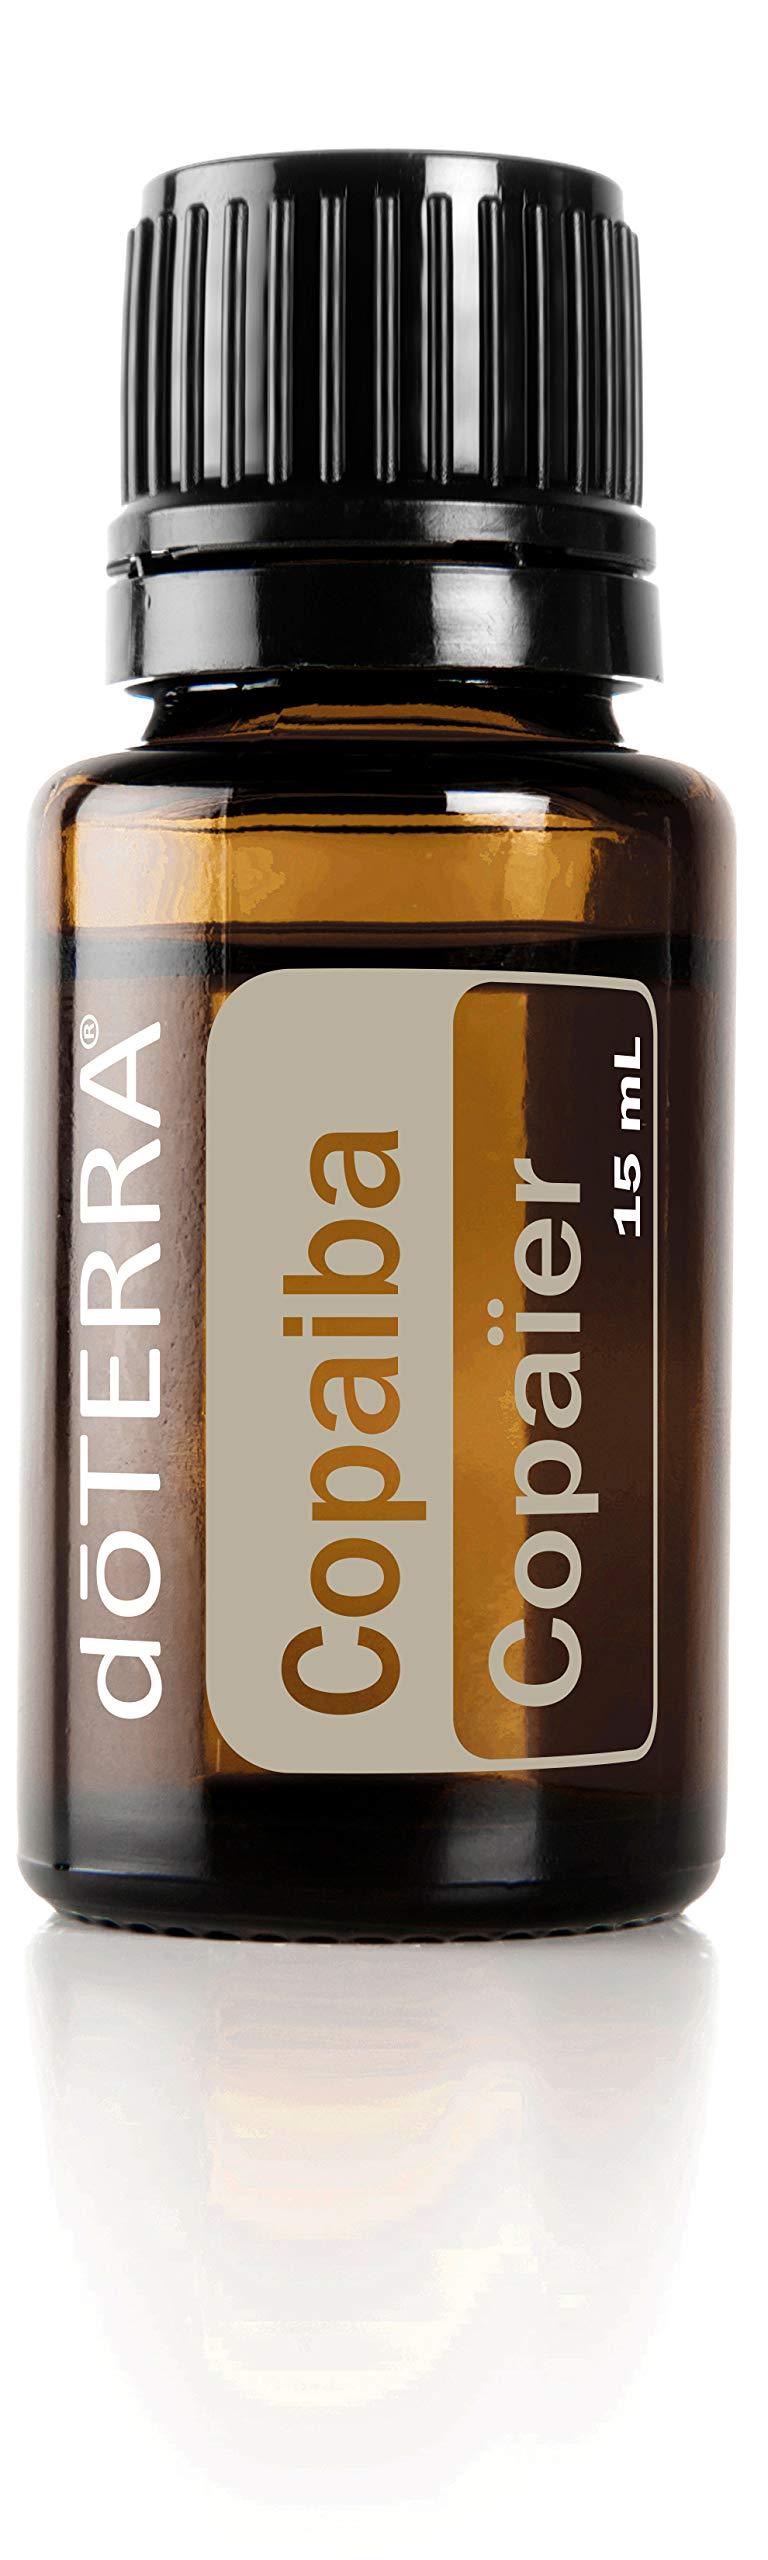 doTERRA - Copaiba Essential Oil - 15 mL by DoTerra